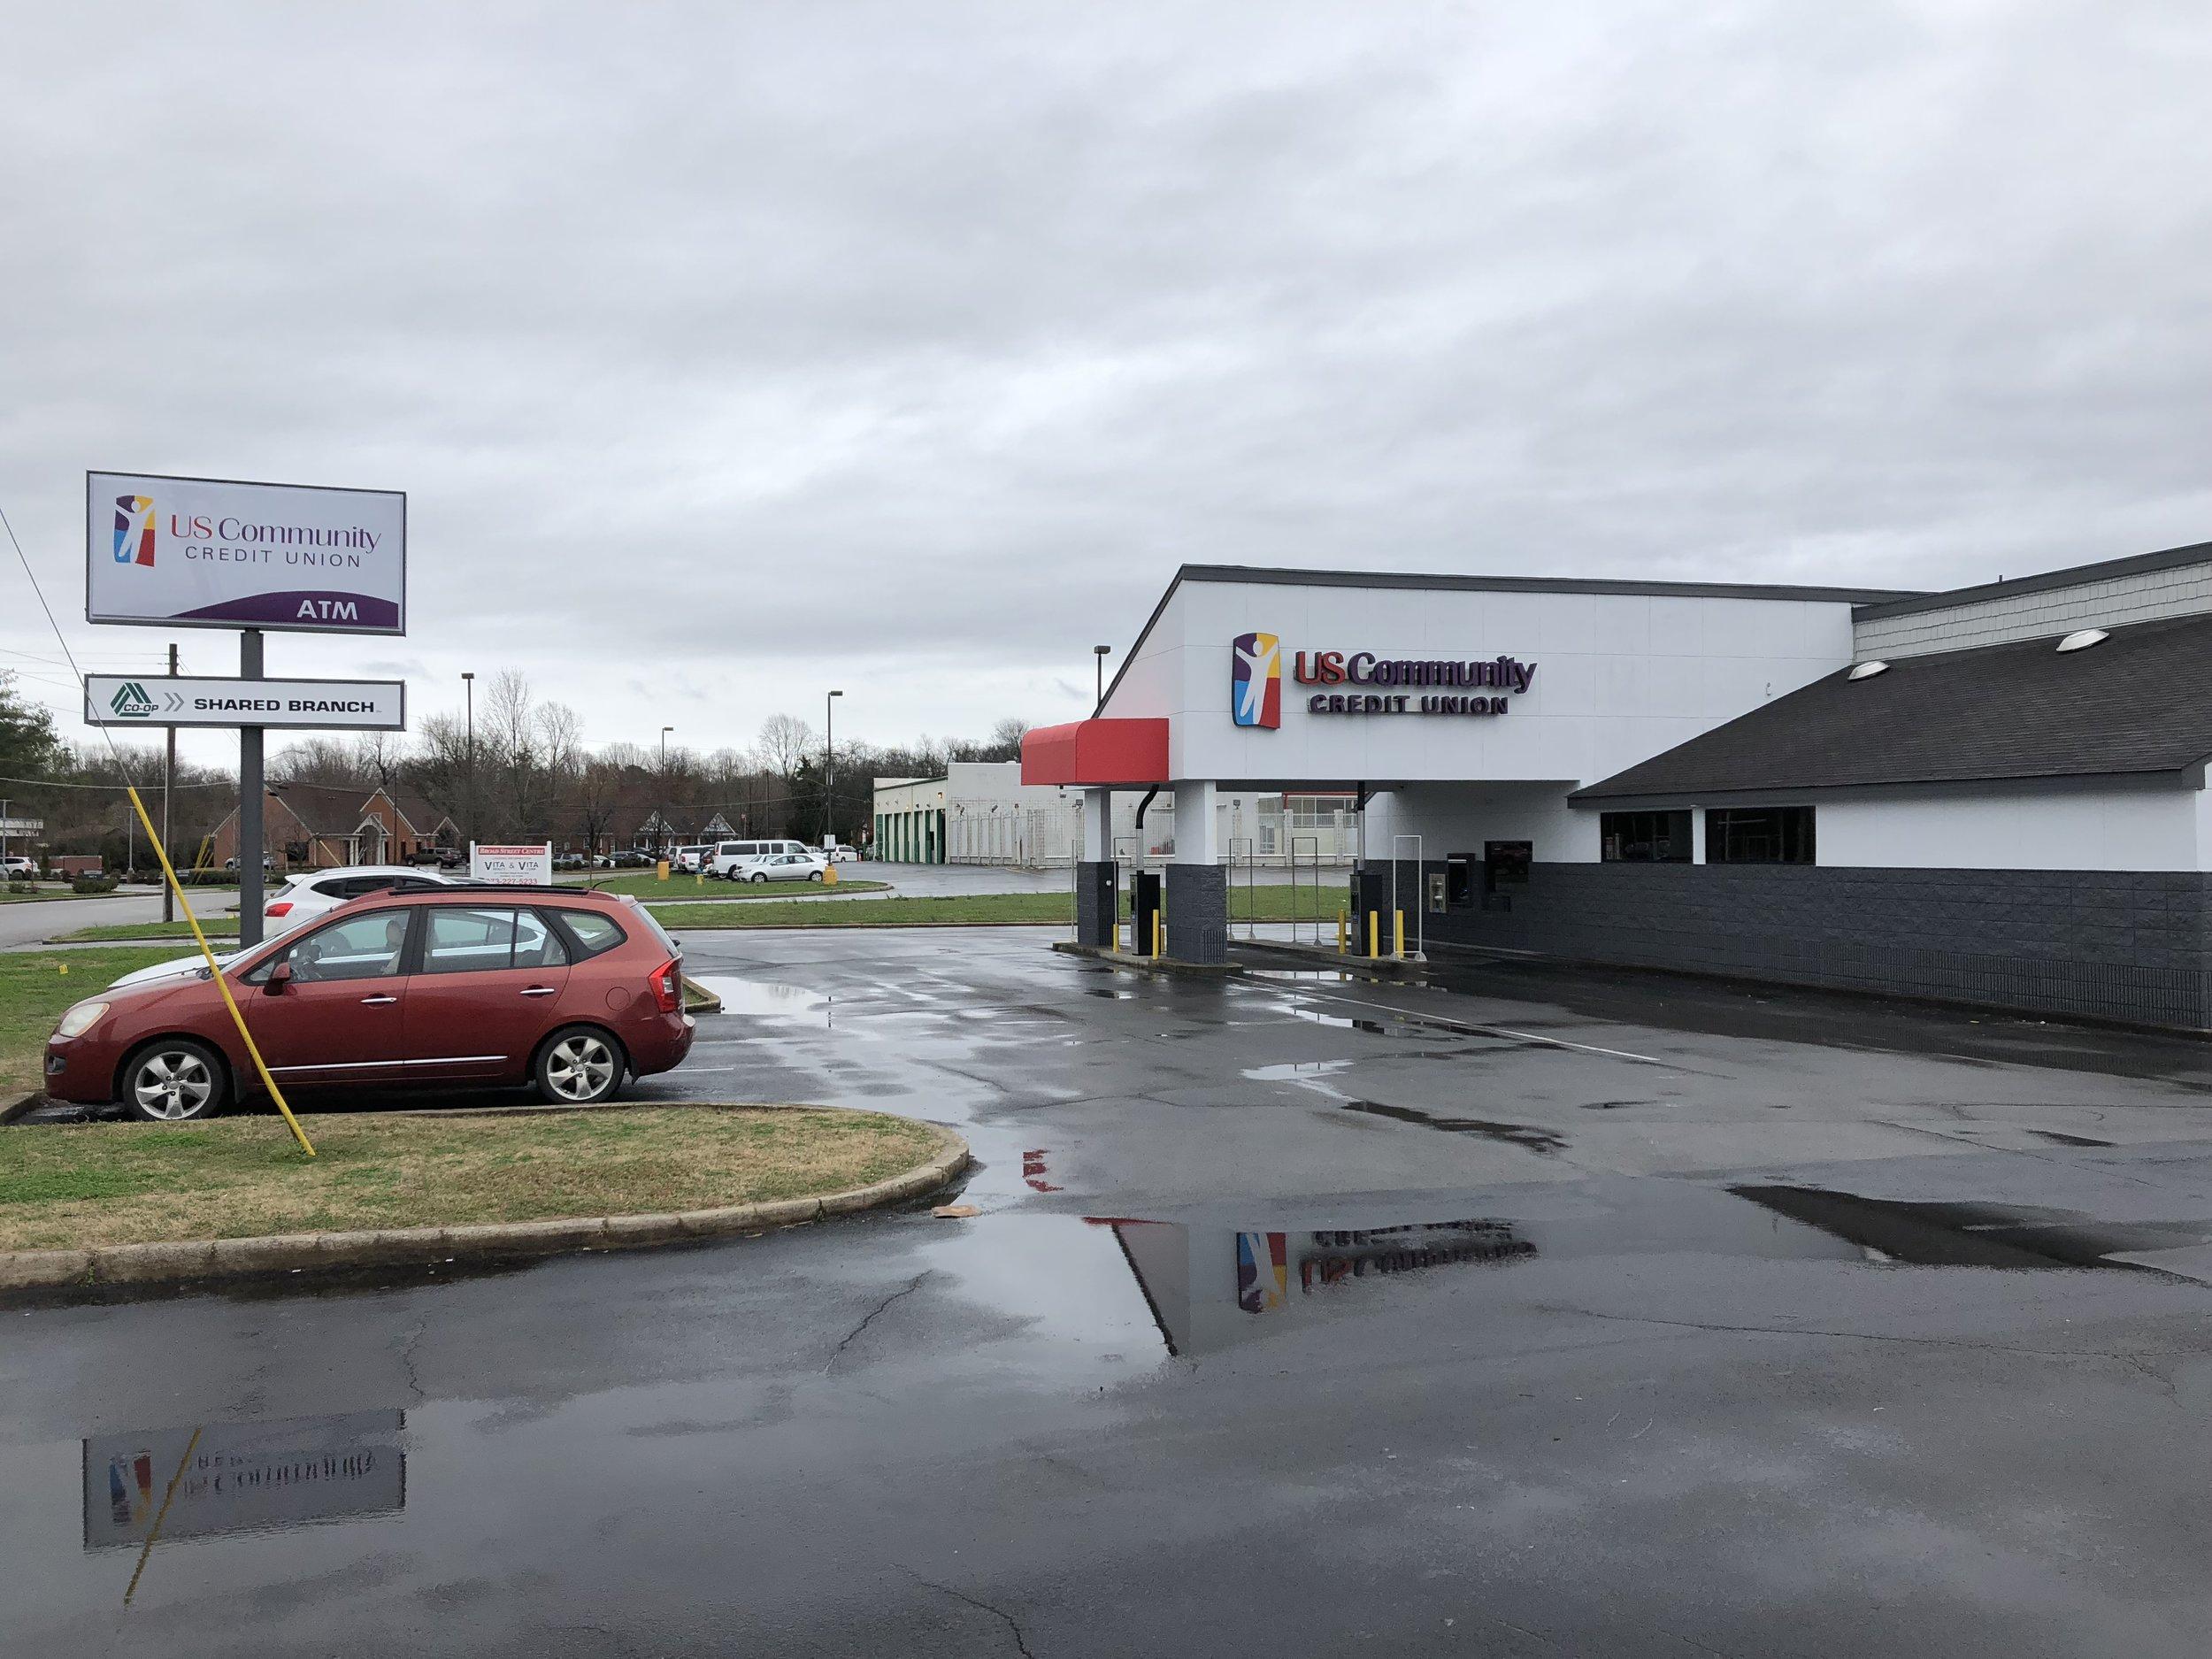 A side photo of the Murfreesboro branch facade